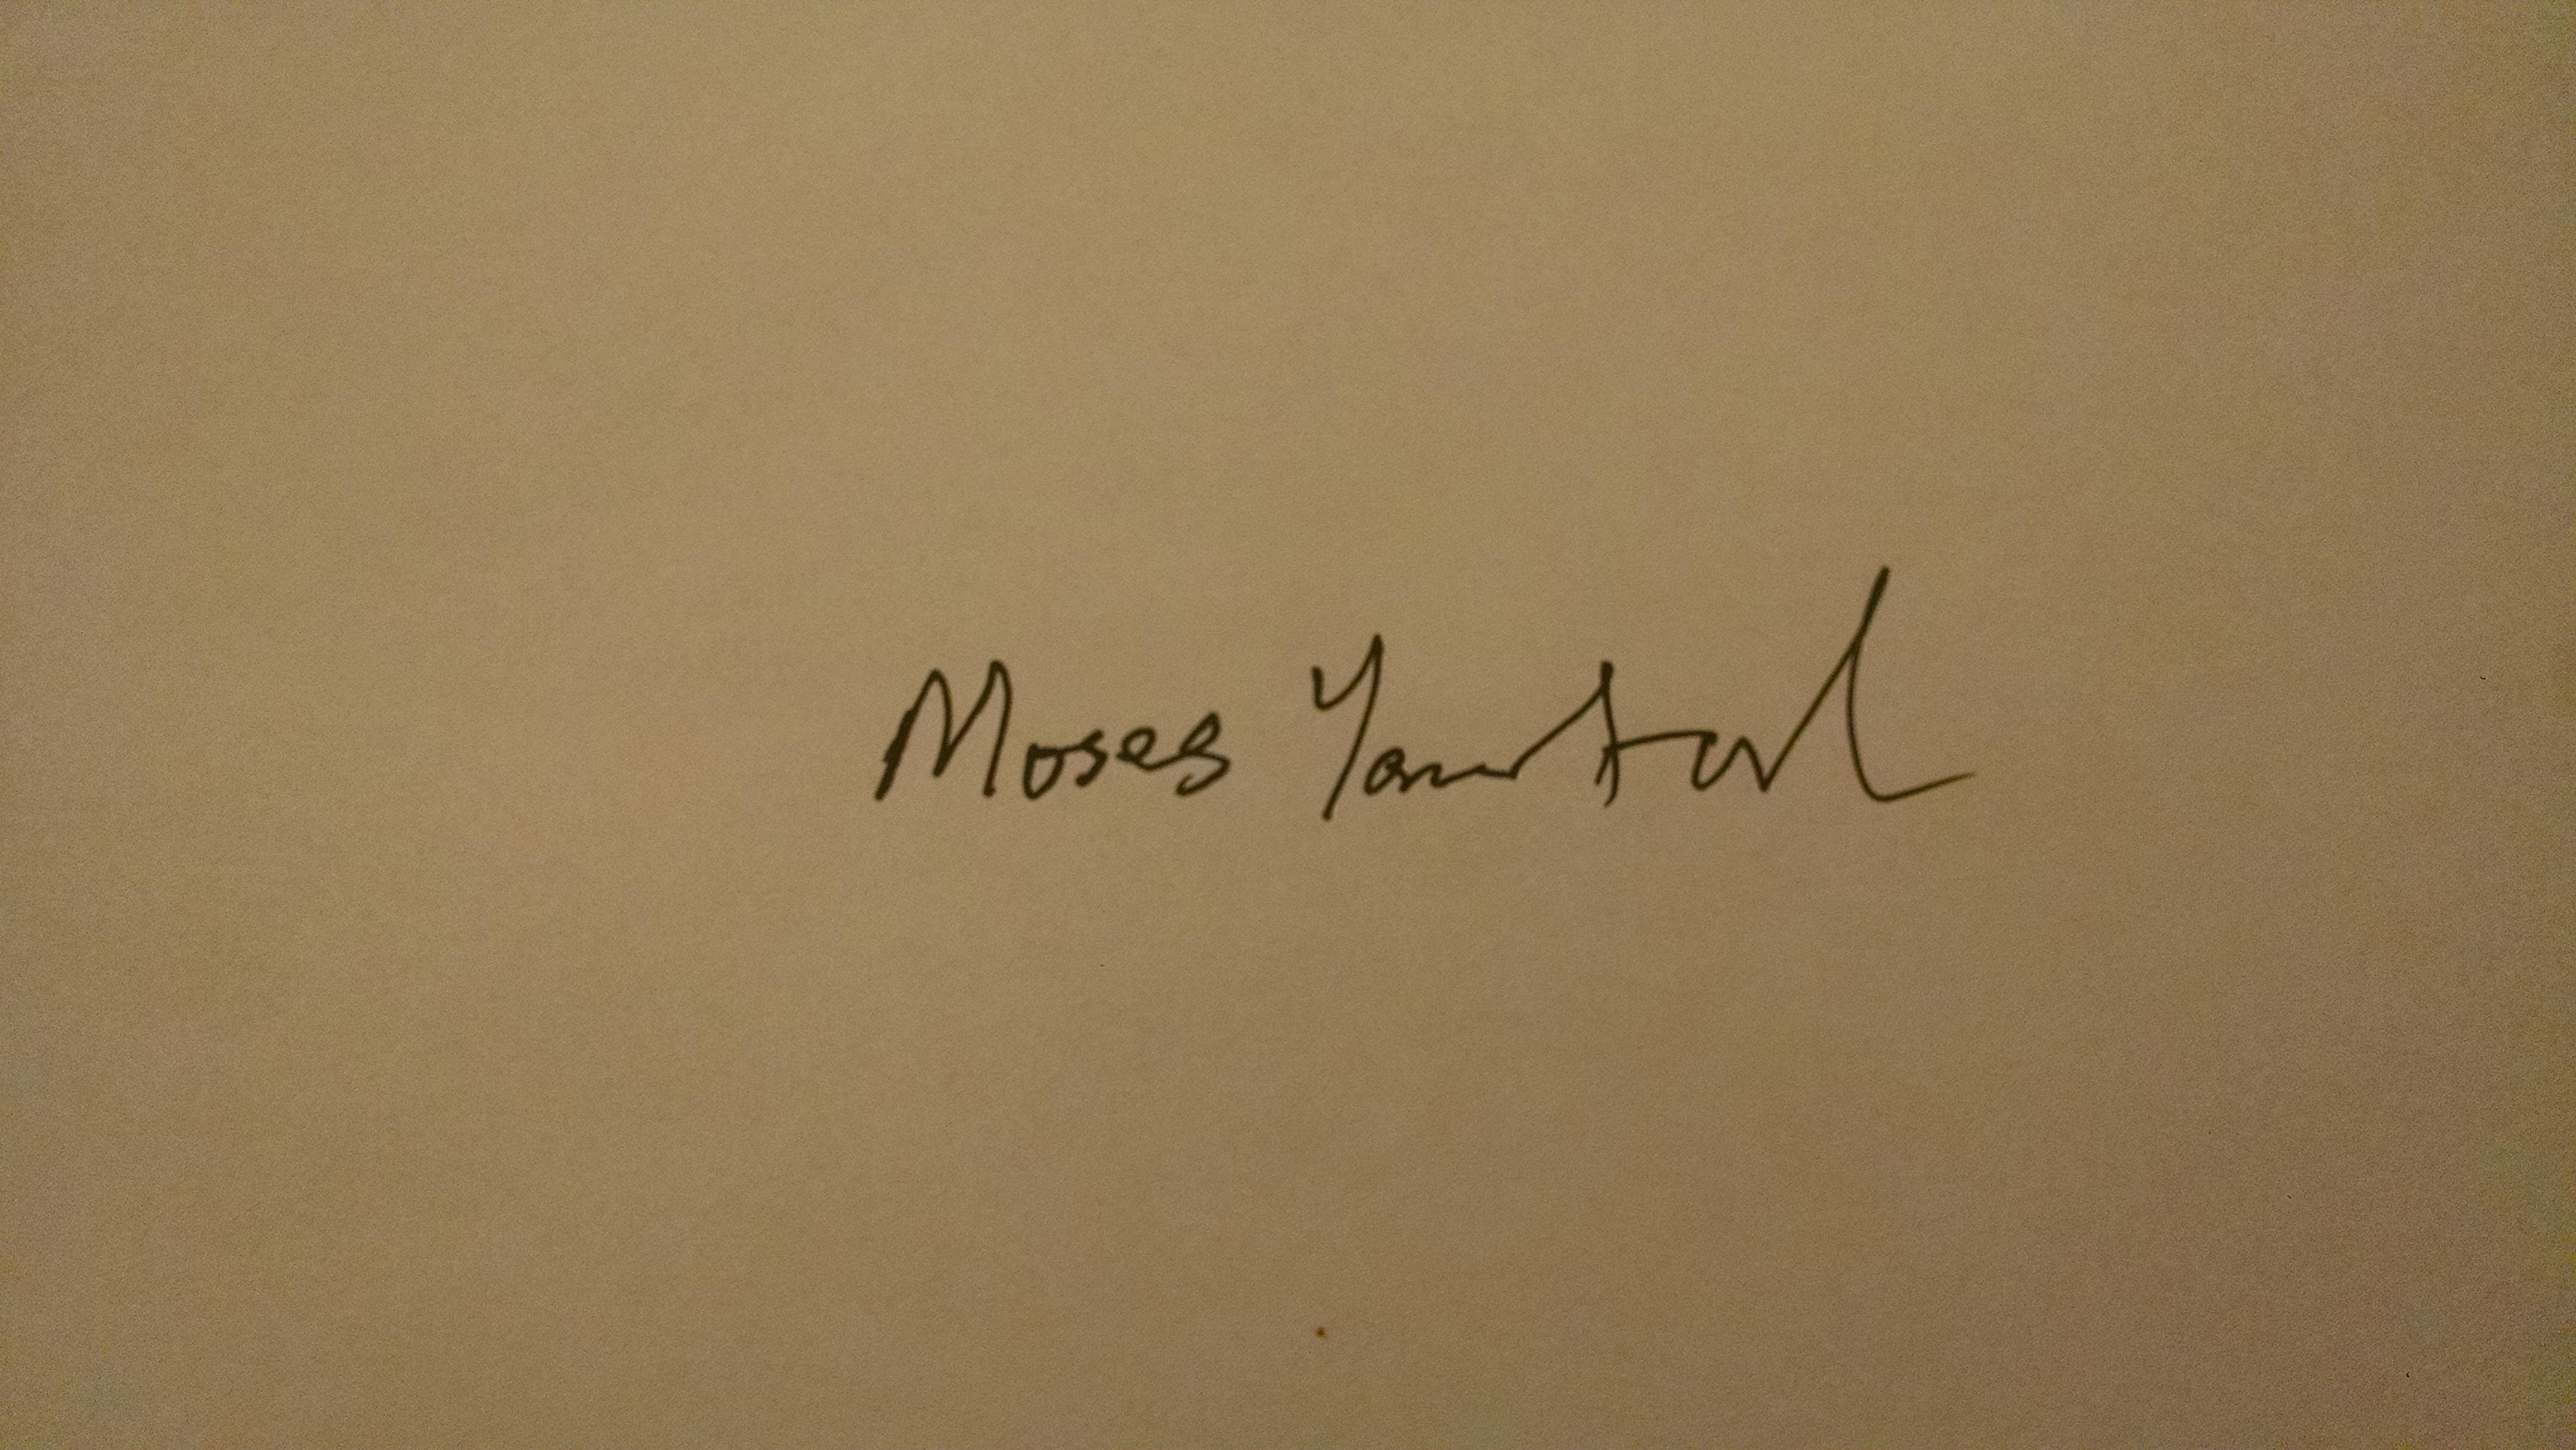 Moses Yamtal Signature